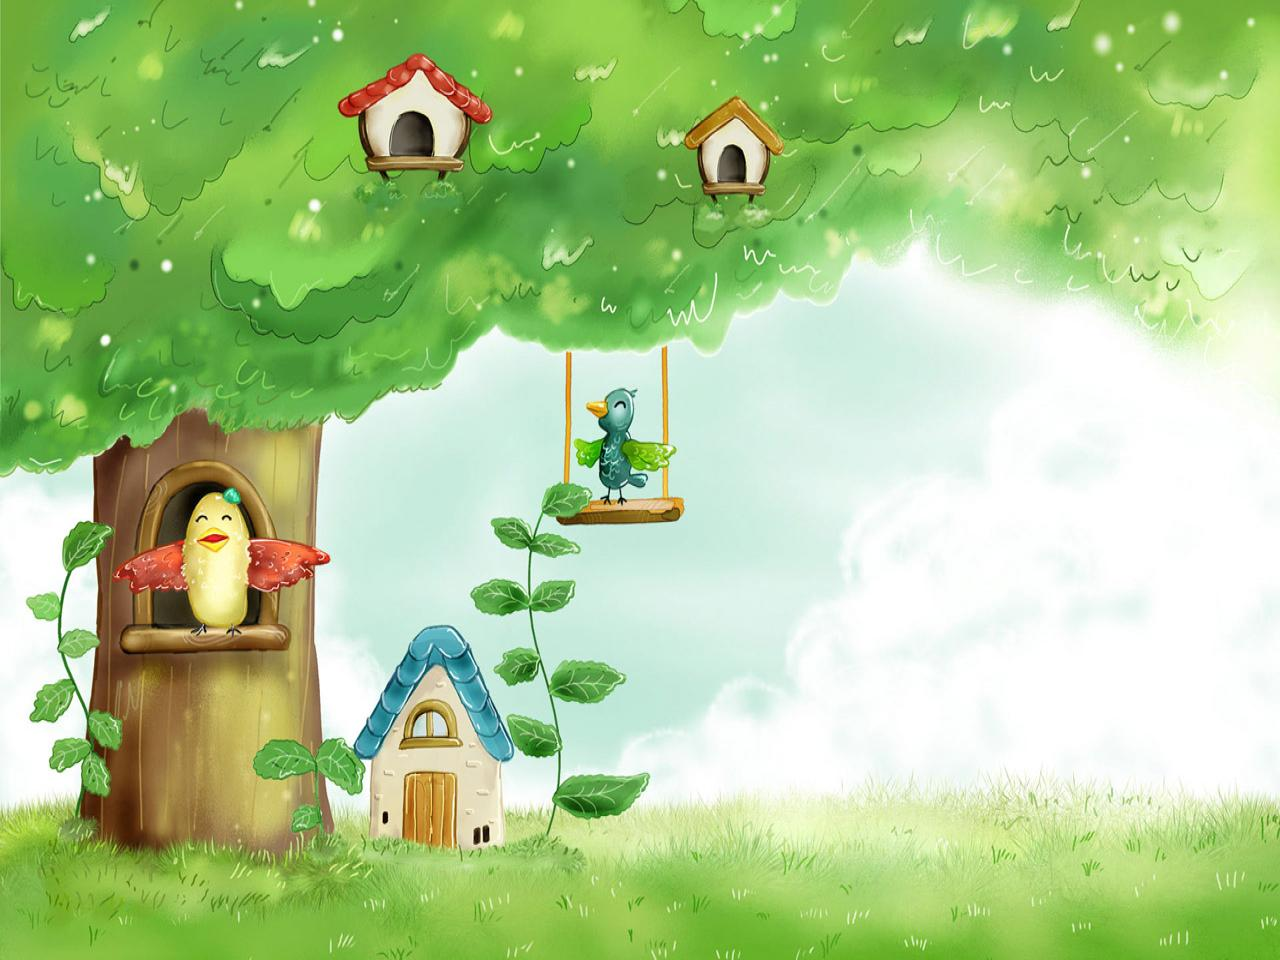 download Cute Spring Backgrounds wallpaper wallpaper hd 1280x960